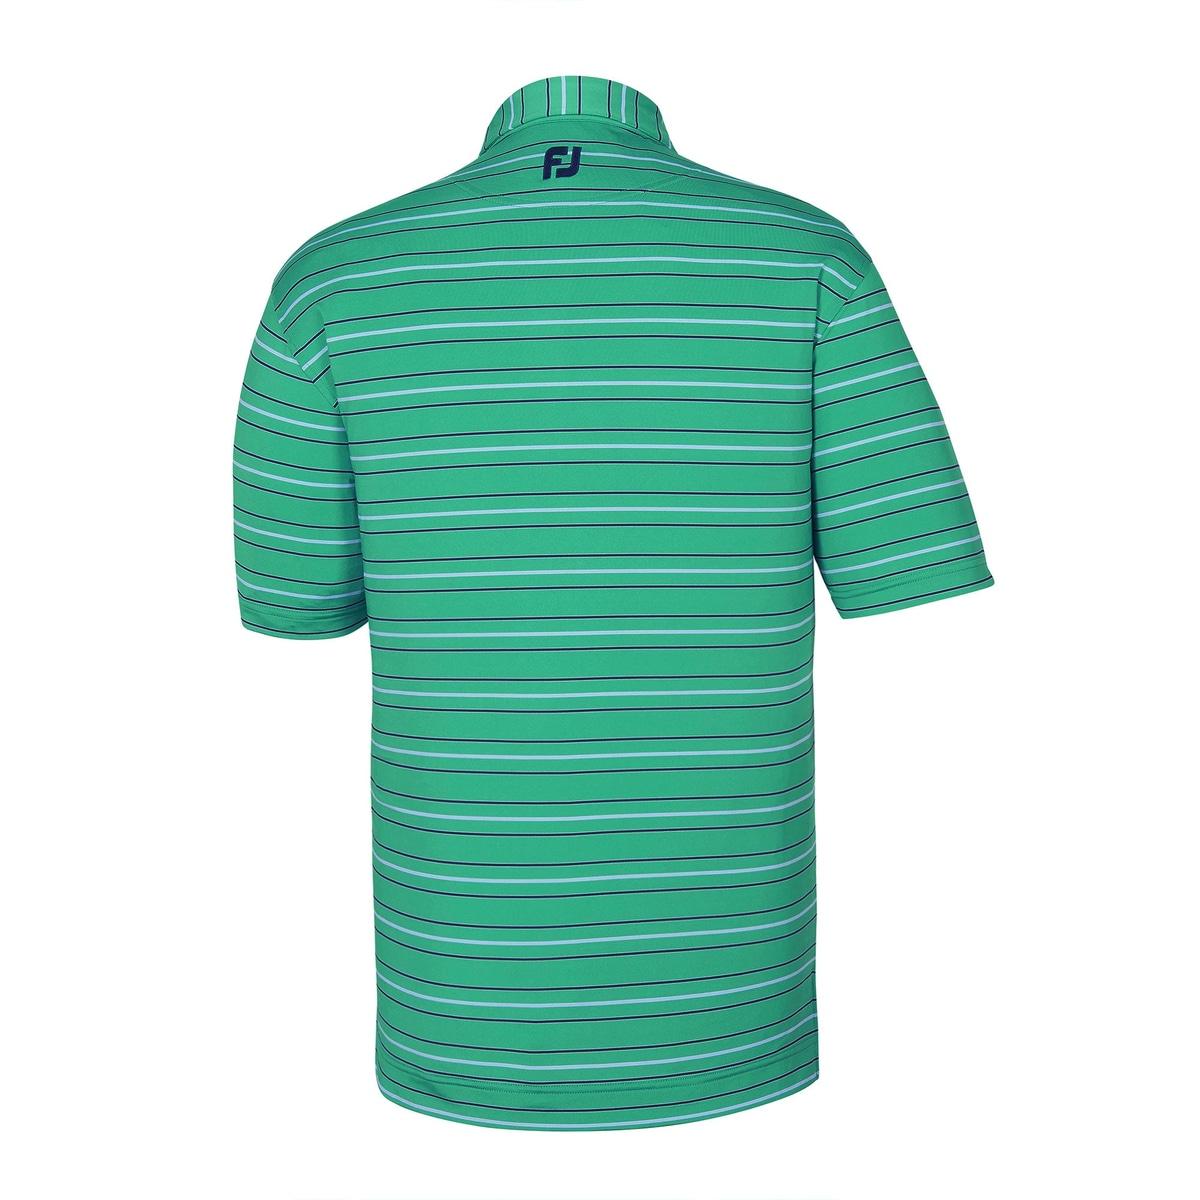 Lisle Outlined Stripe Self Collar-Previous Season Style